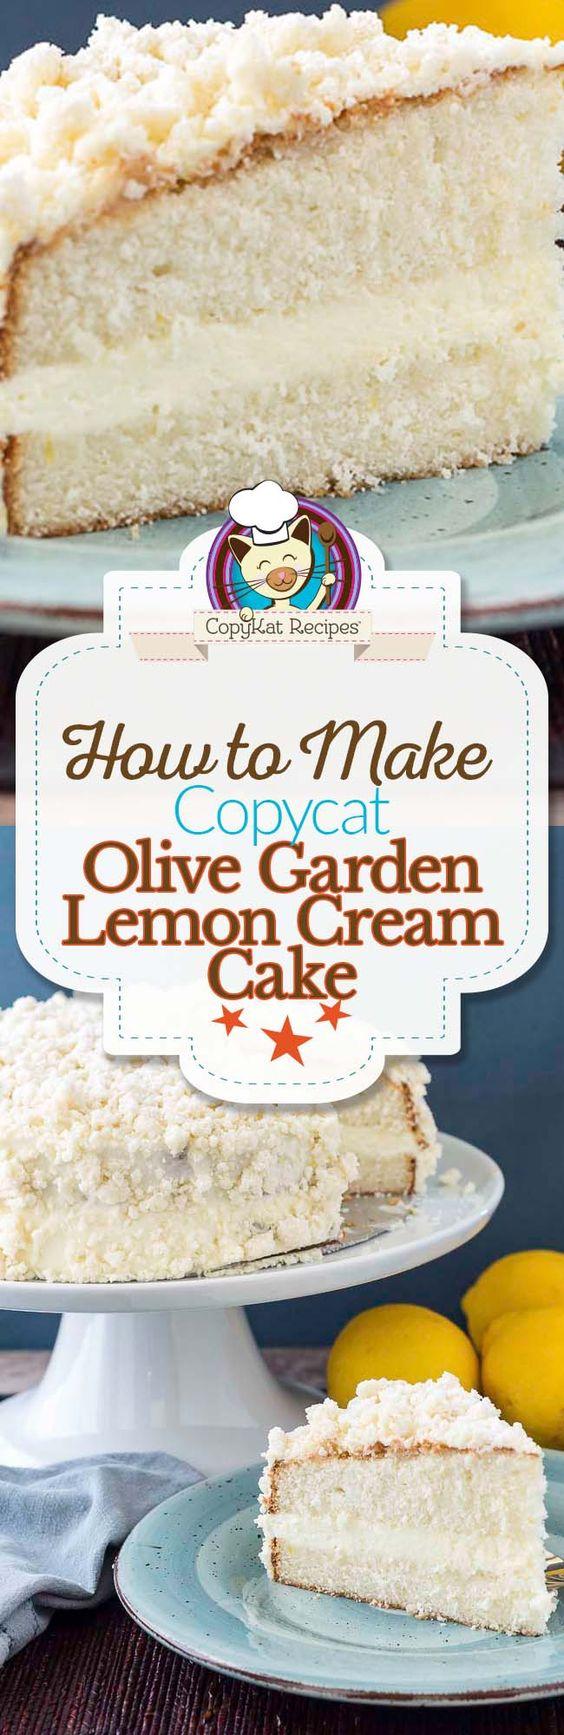 Olive garden lemon cream cake recipe - Olive garden lemon cream cake recipe ...